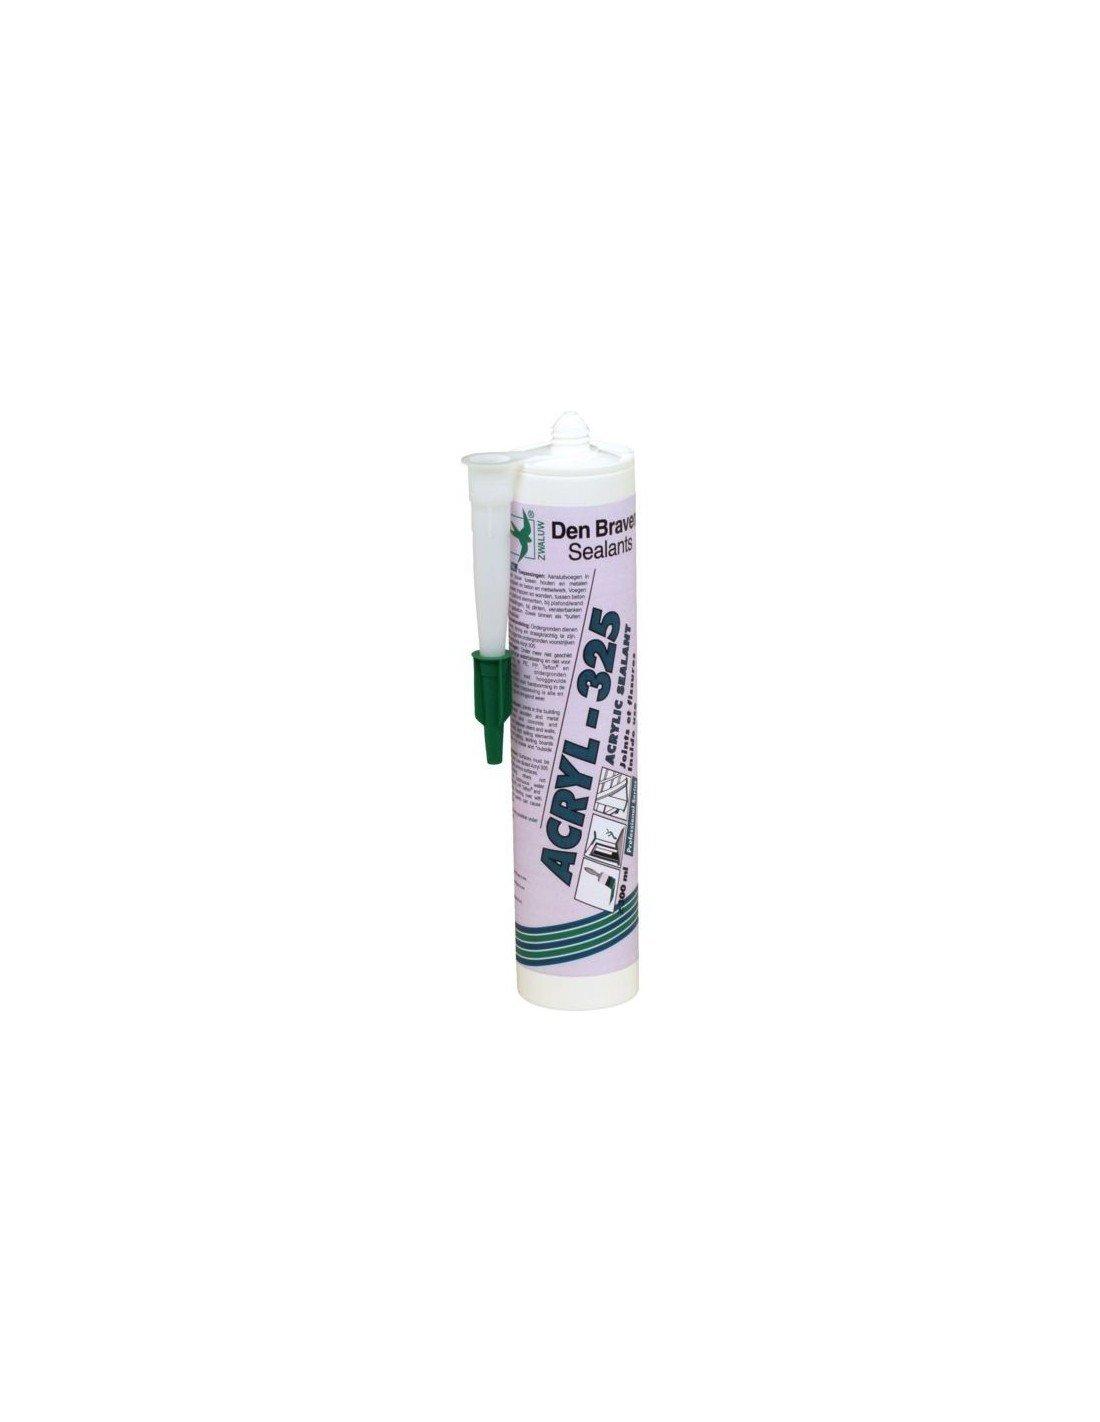 Mastic acrylique Acryl 325 blanc cartouche de 300ml Den Braven DEN BRAVEN FRANCE